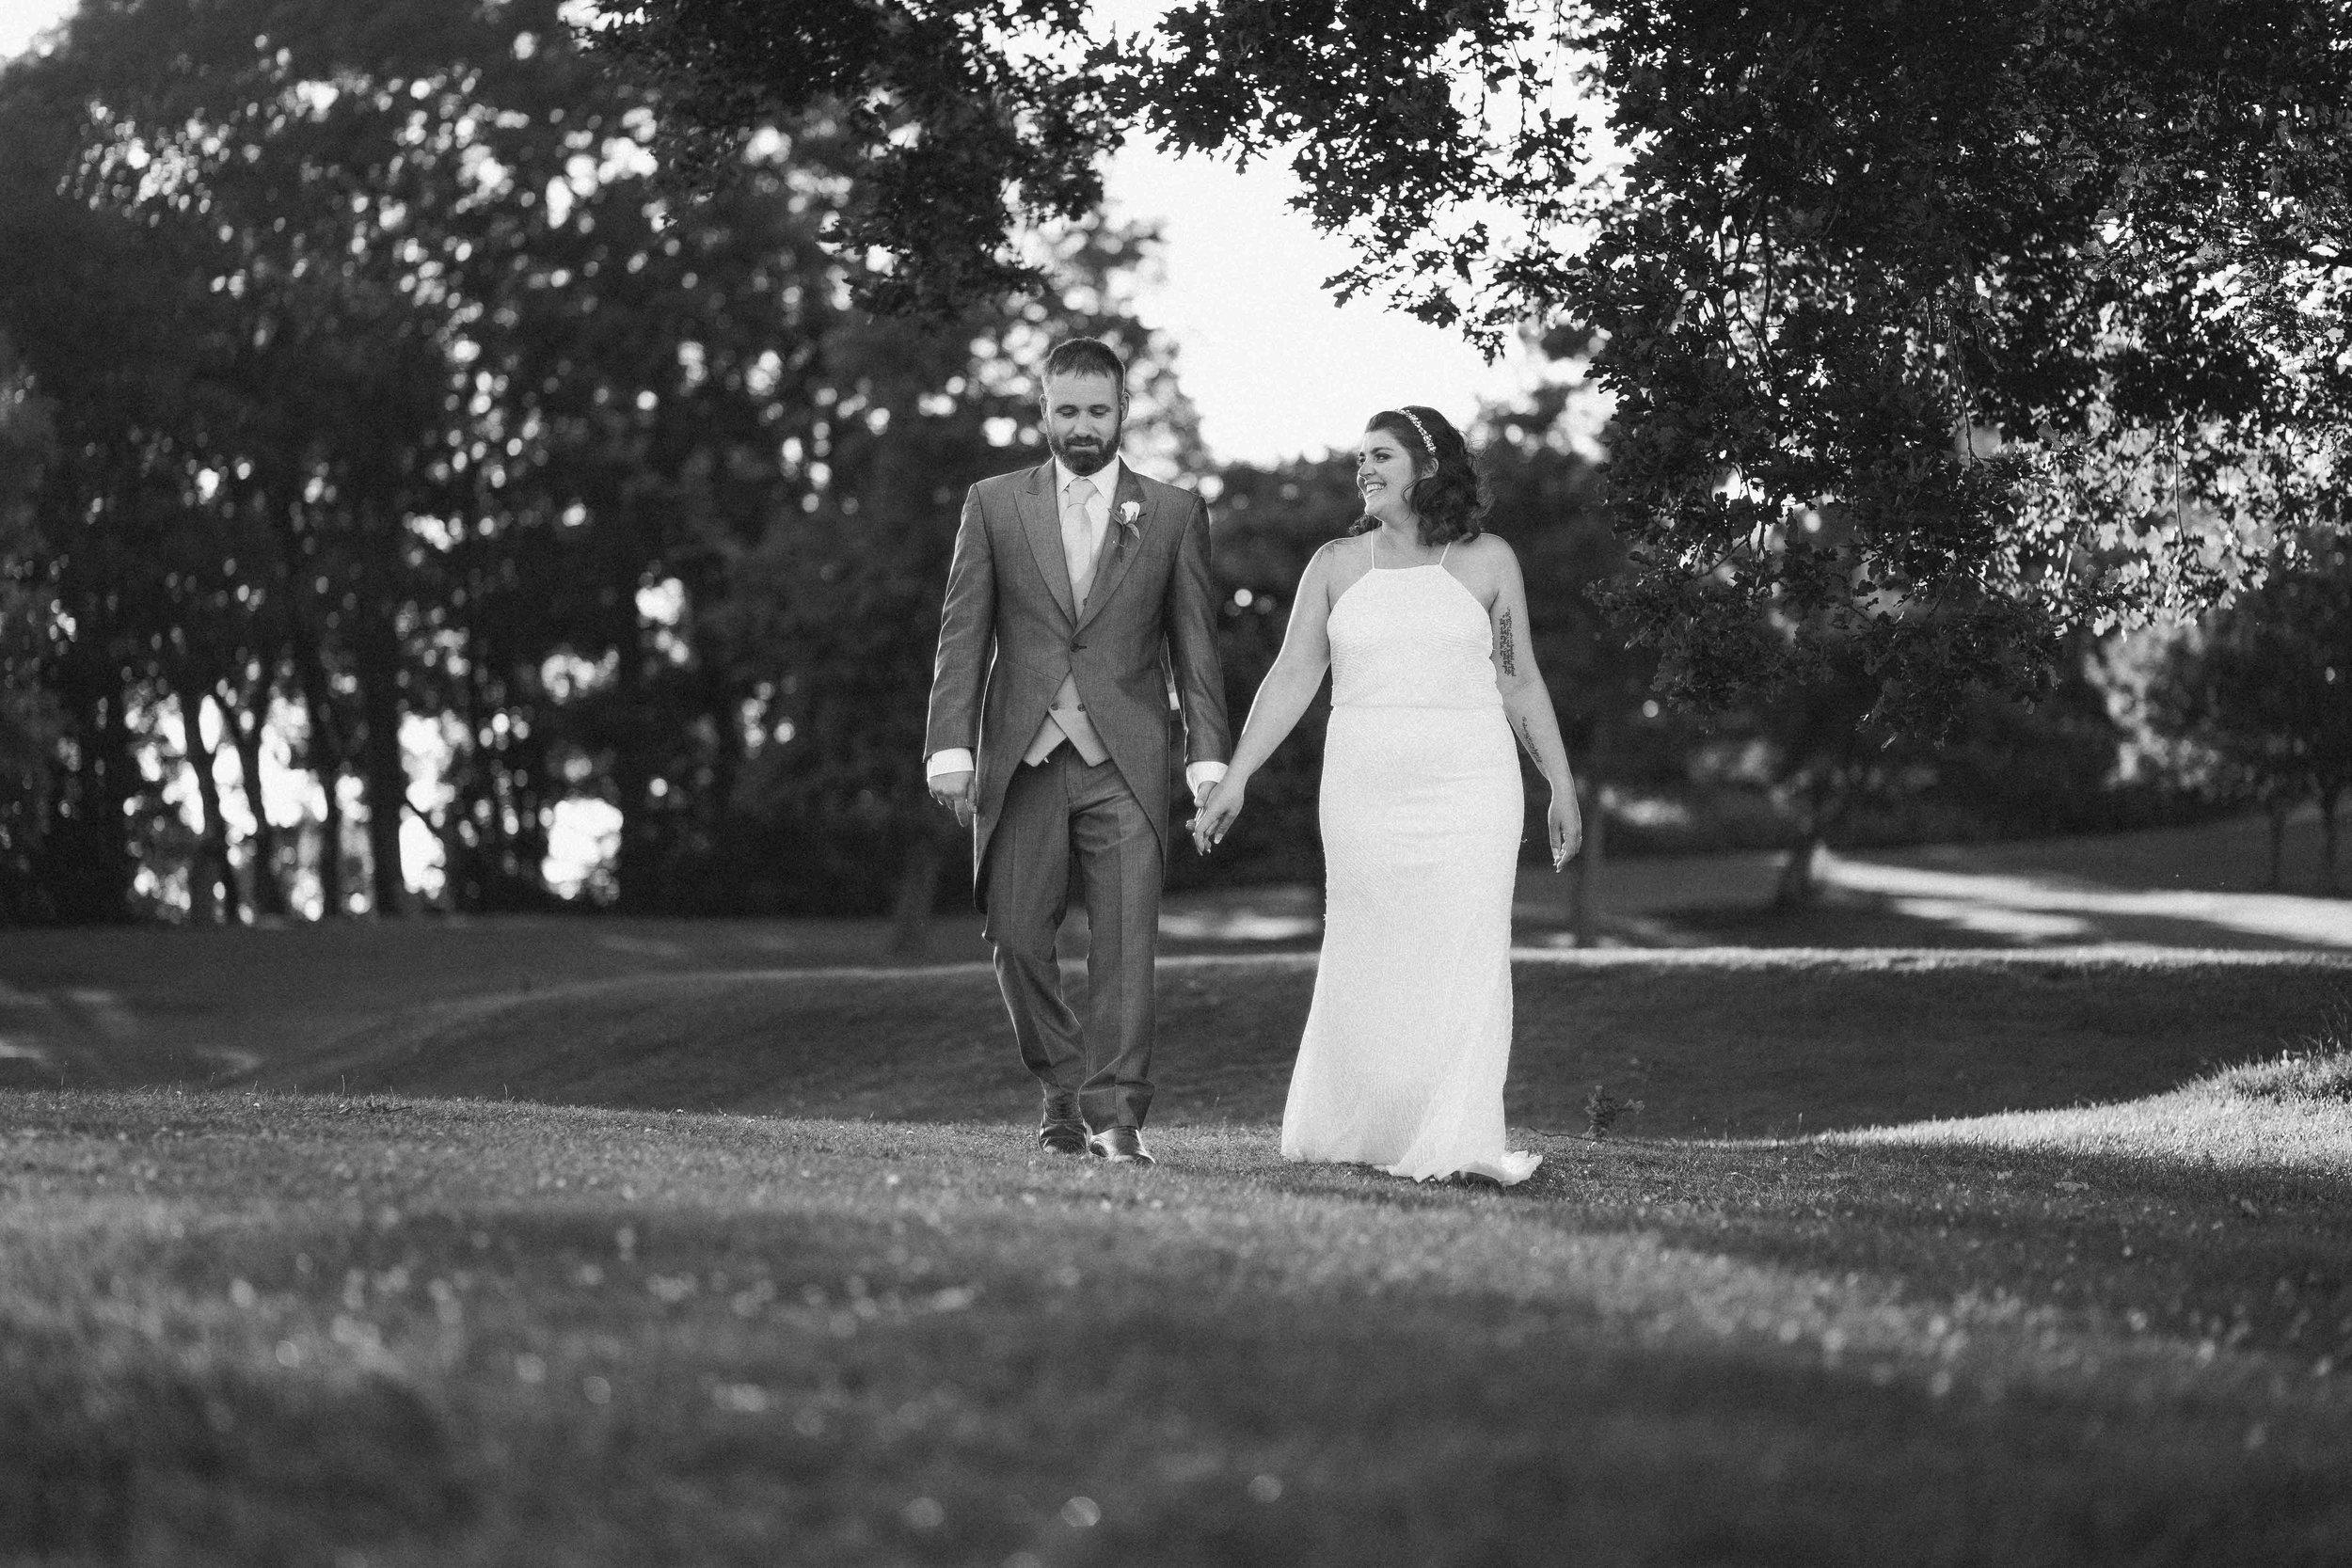 Lea-cooper-photography-wedding-photography-wolverhampton-patshull-park-hotel-wedding-pattingham-wolverhampton-west-midlands-uk-38.JPG